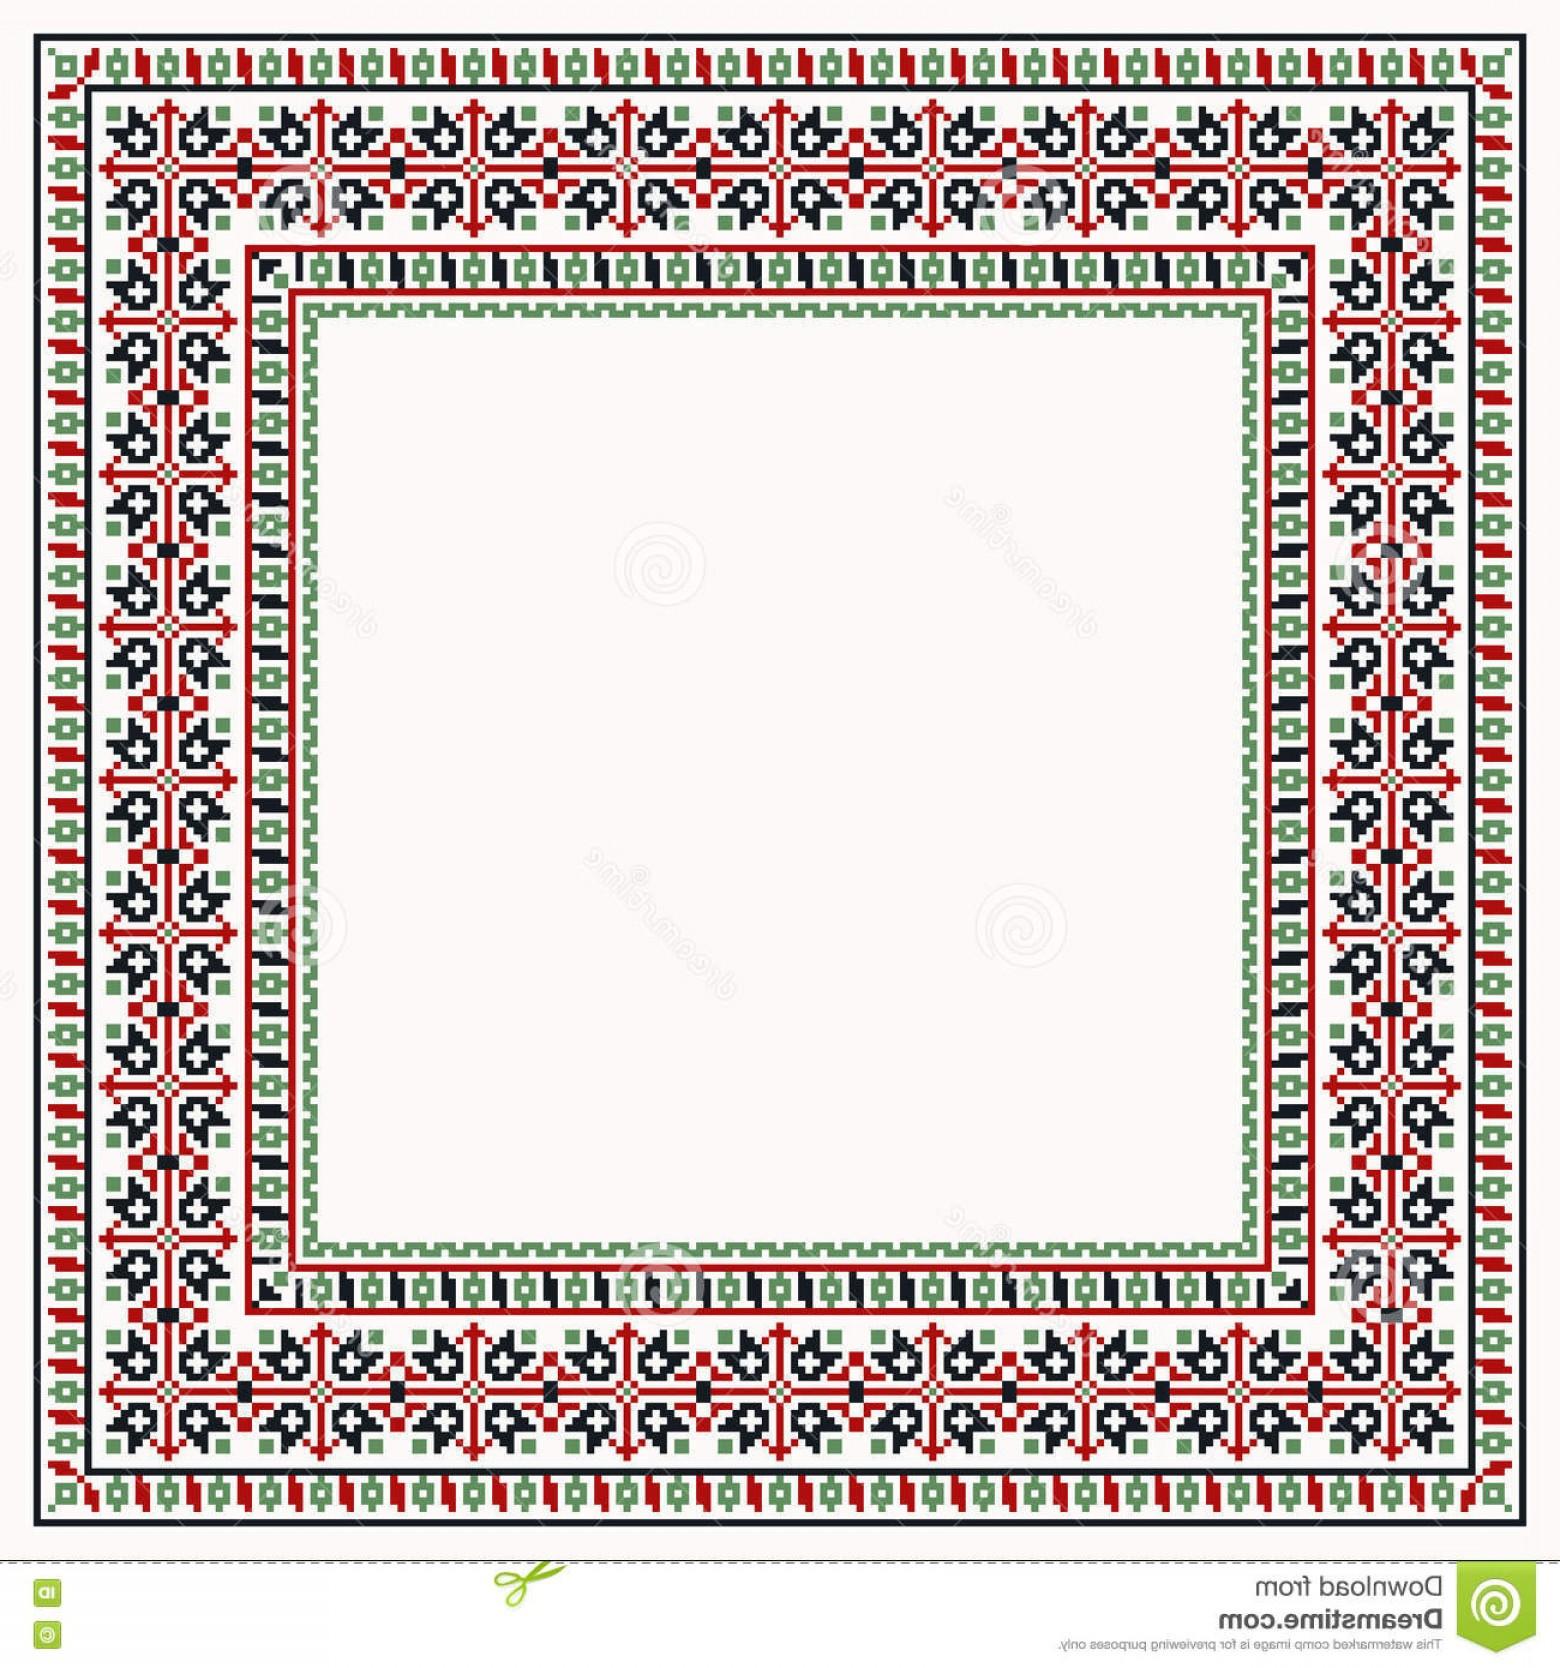 1560x1668 Stock Illustration Cross Stitch Colorful Border Ethnic Ornament